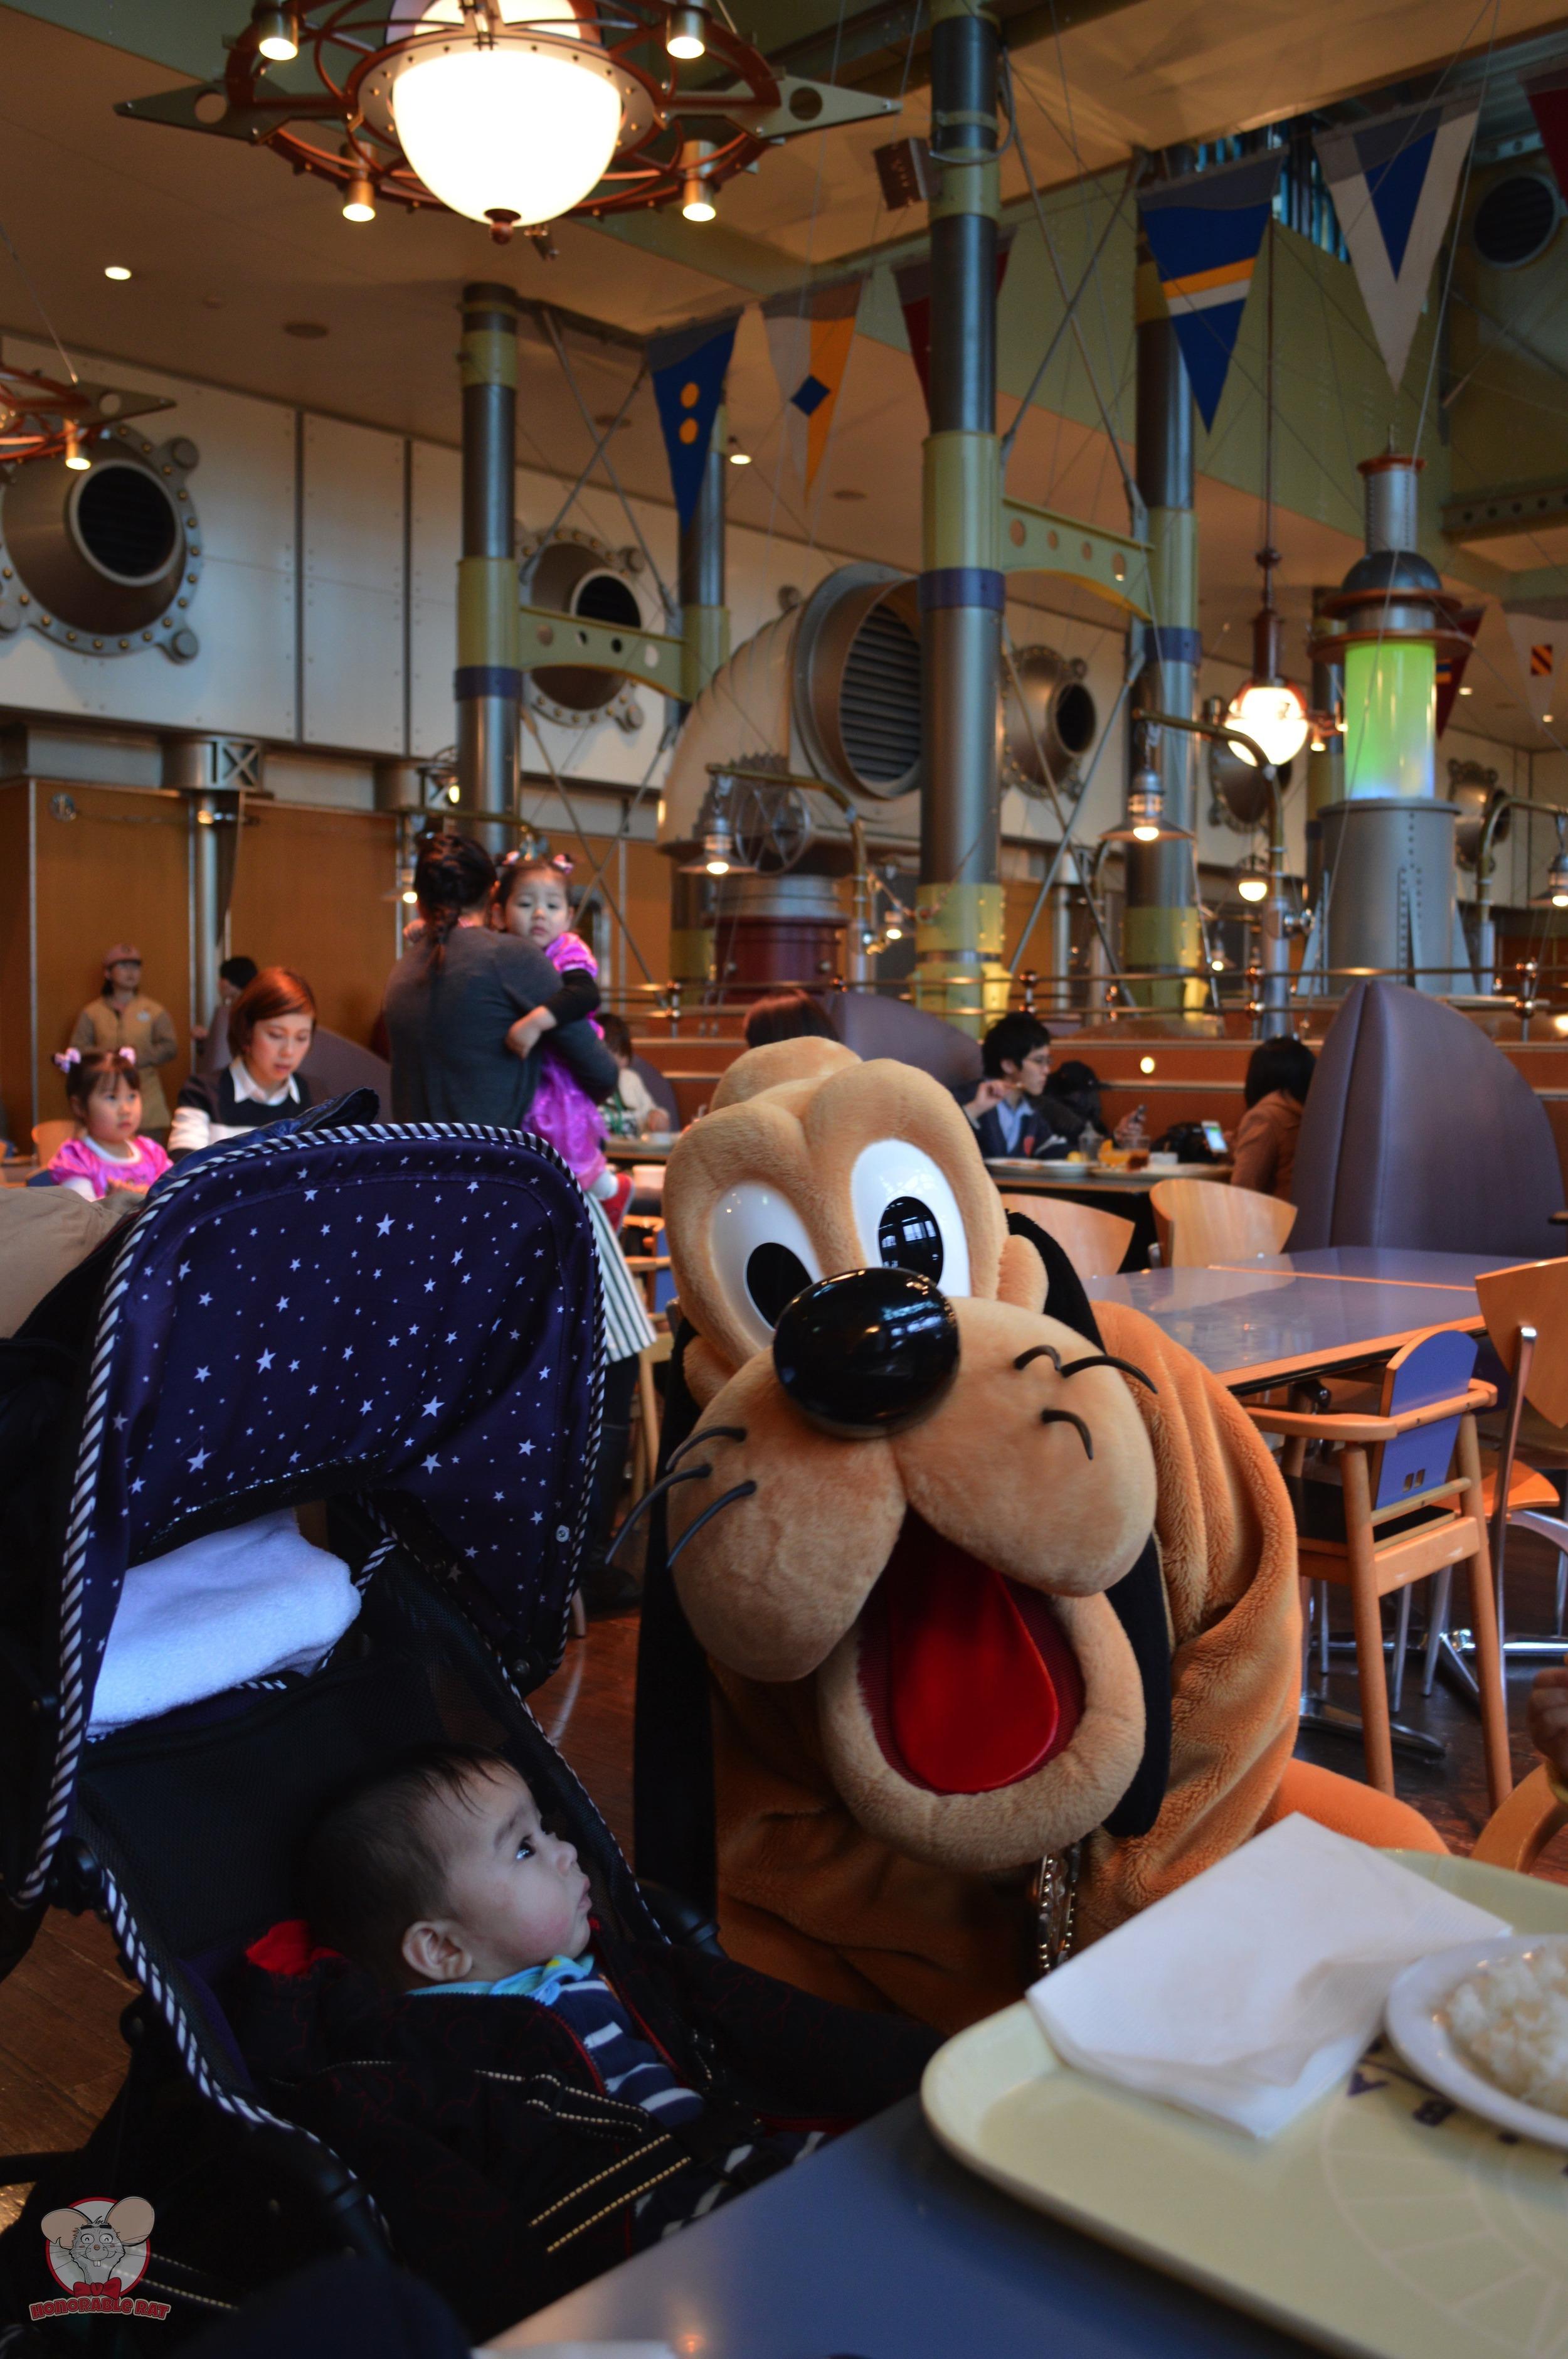 Baby Haku with Pluto